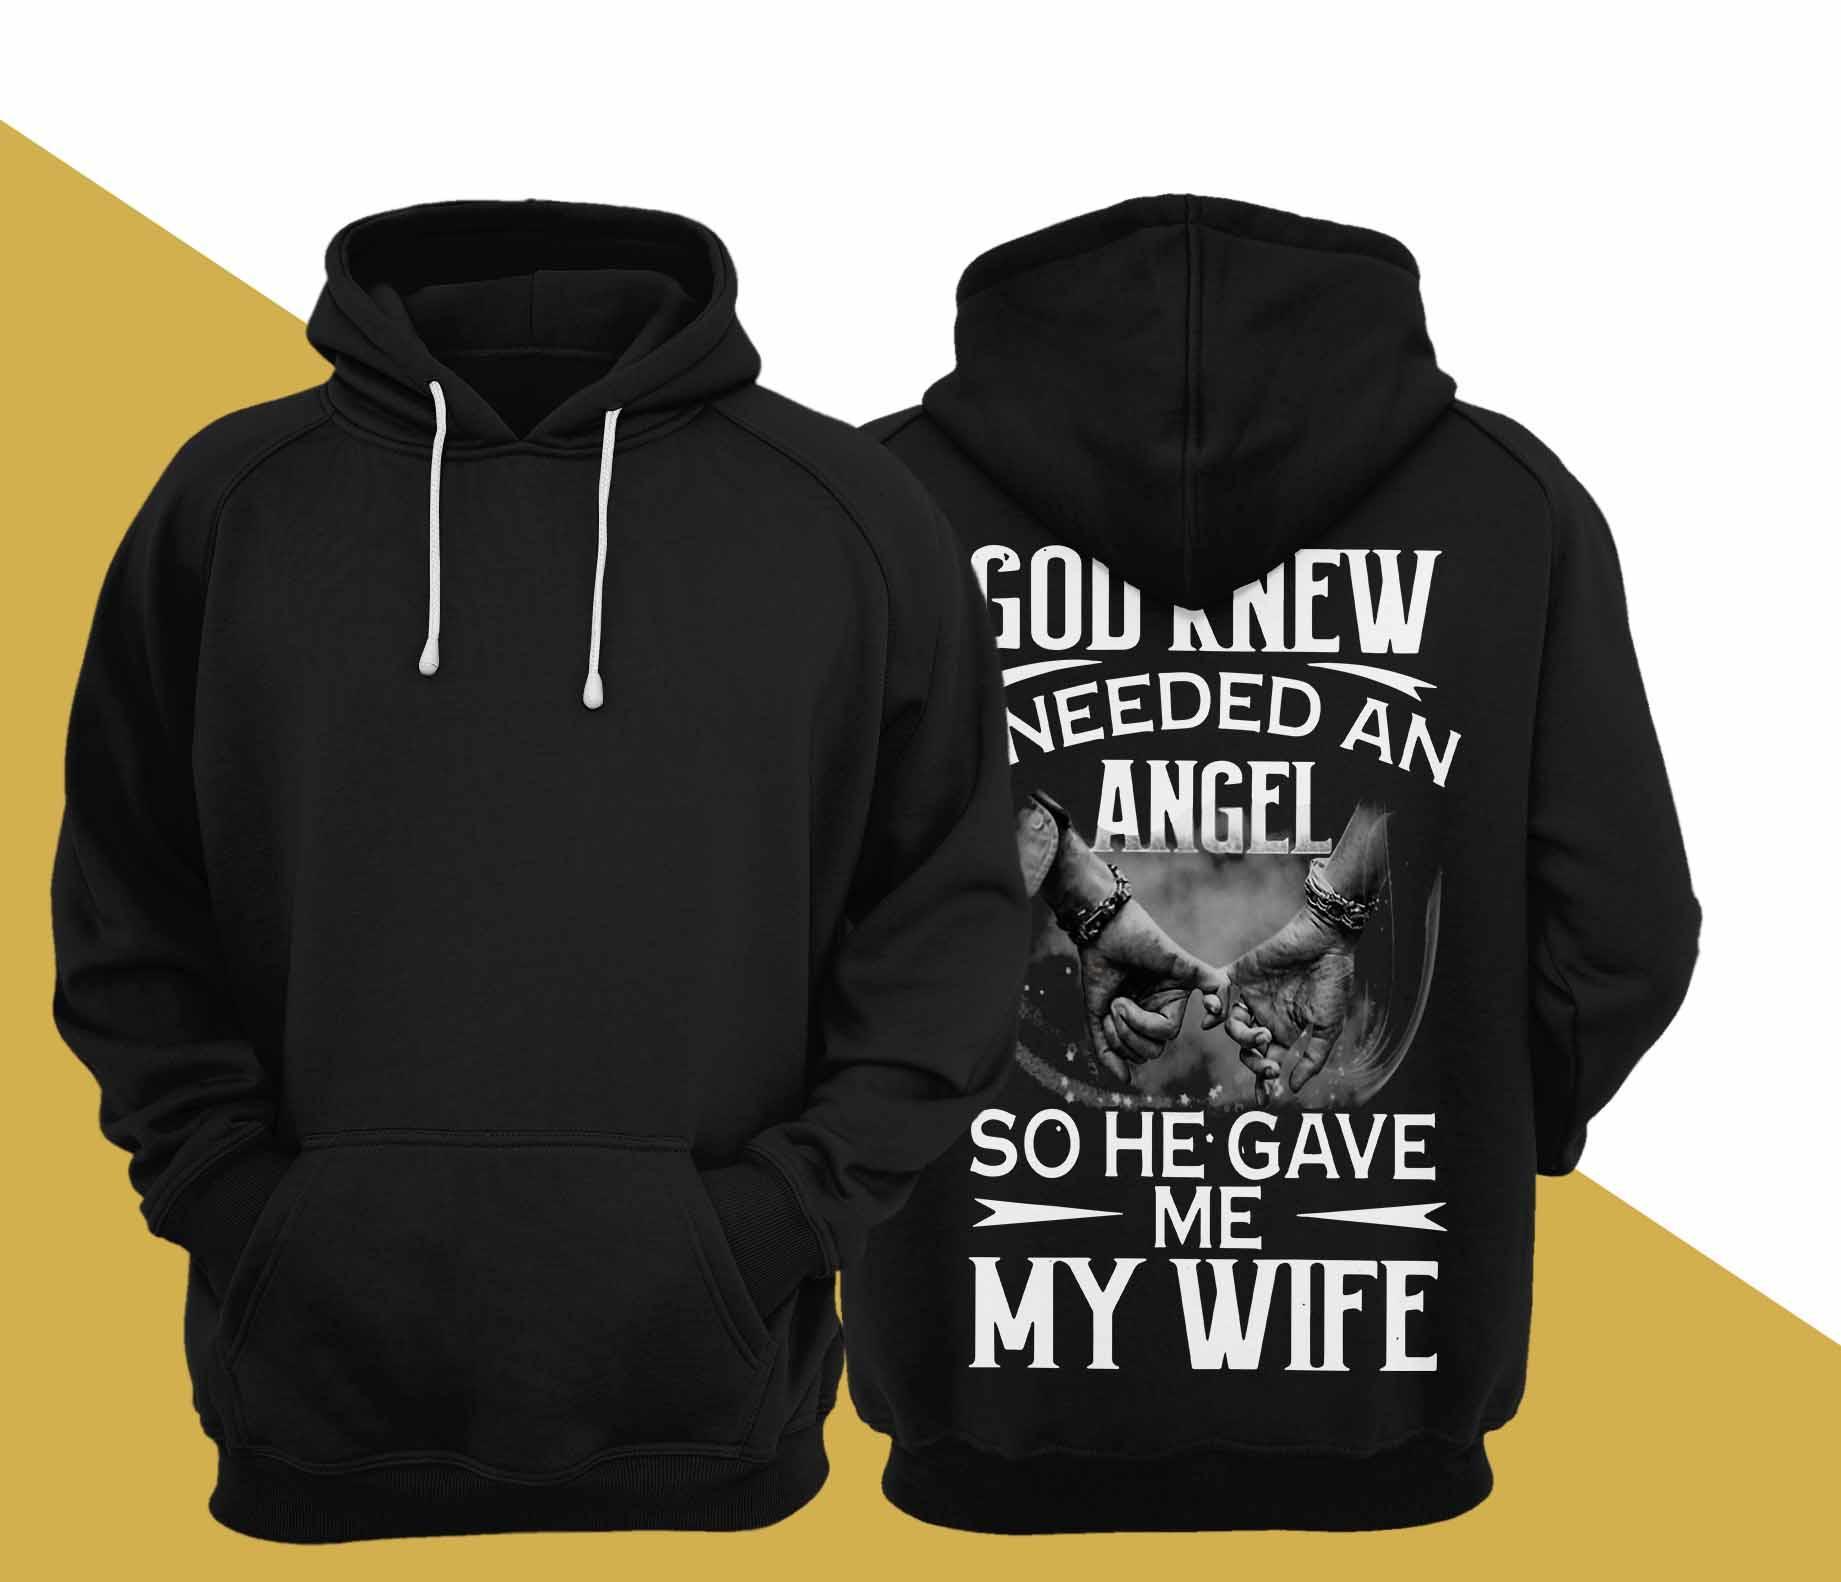 God Knew I Needed An Angel So He Gave Me My Wife Hoodie